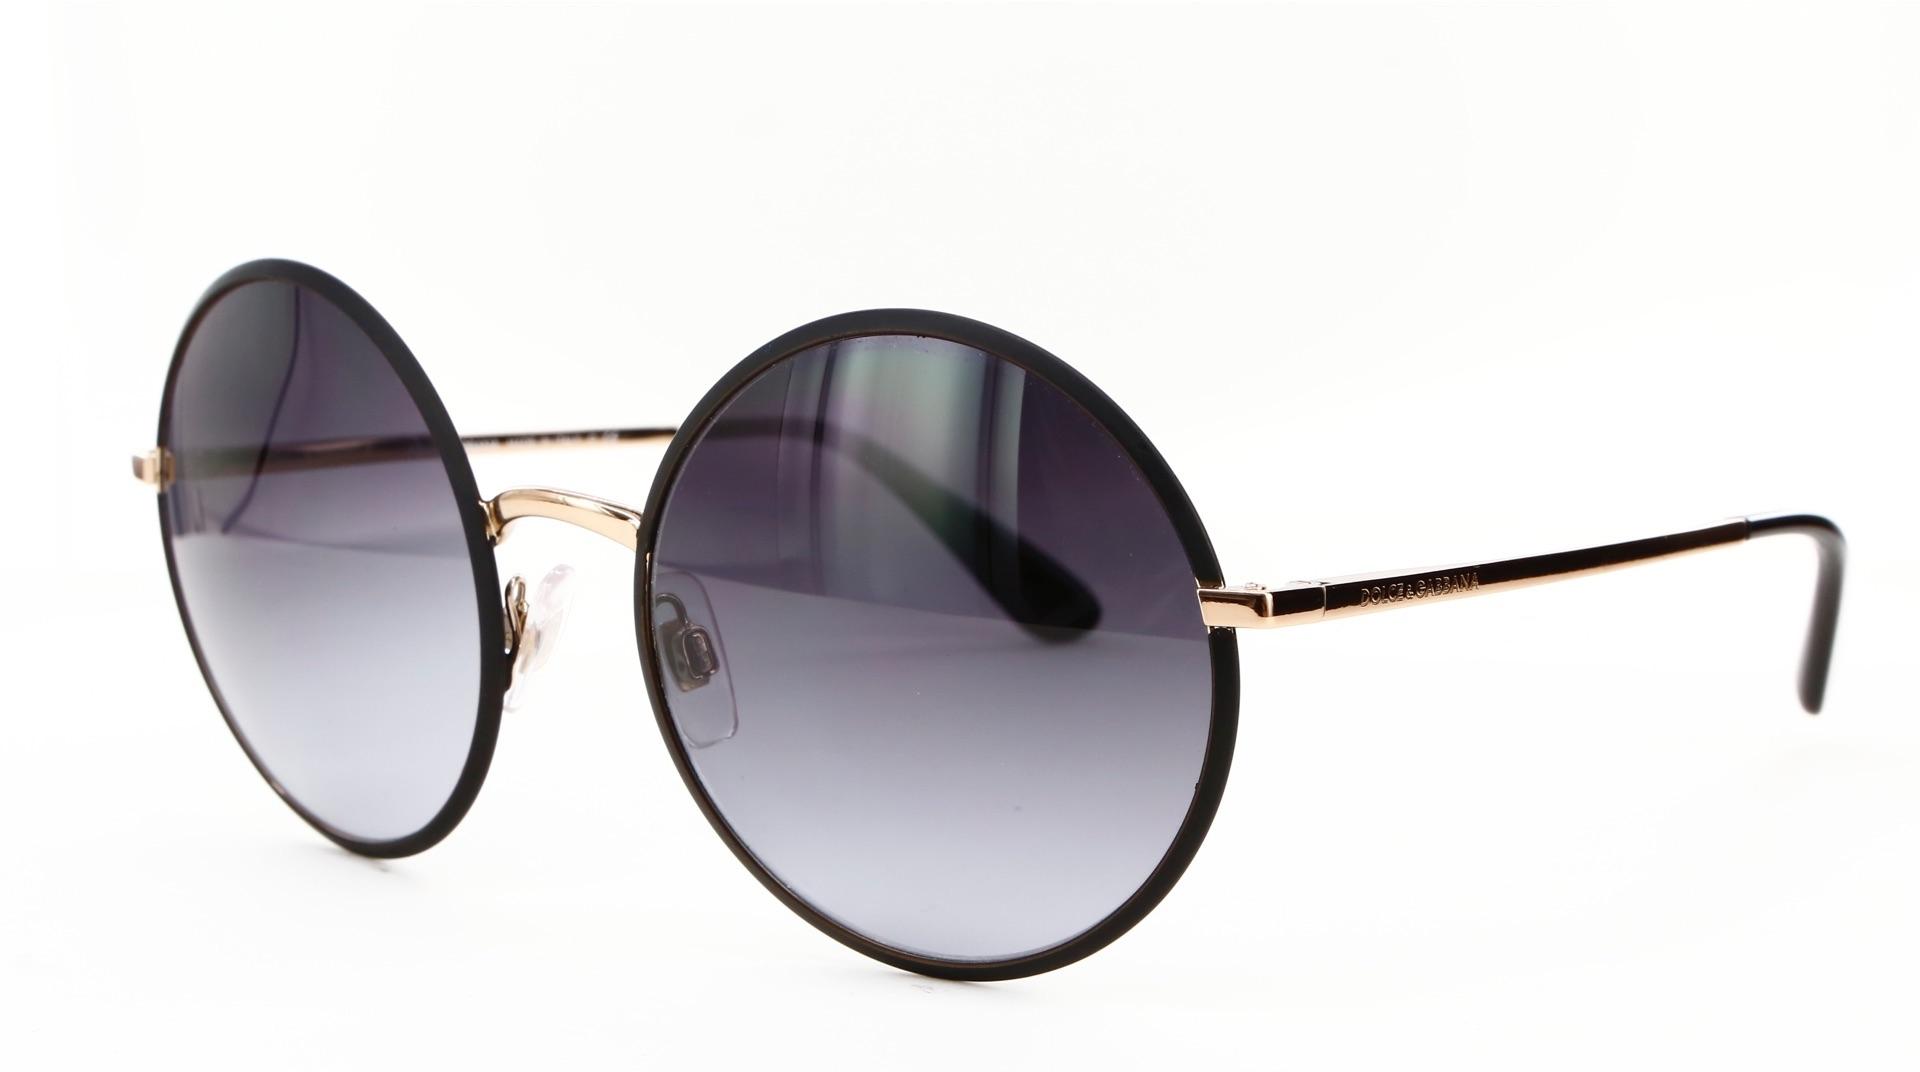 Dolce & Gabbana - ref: 79420